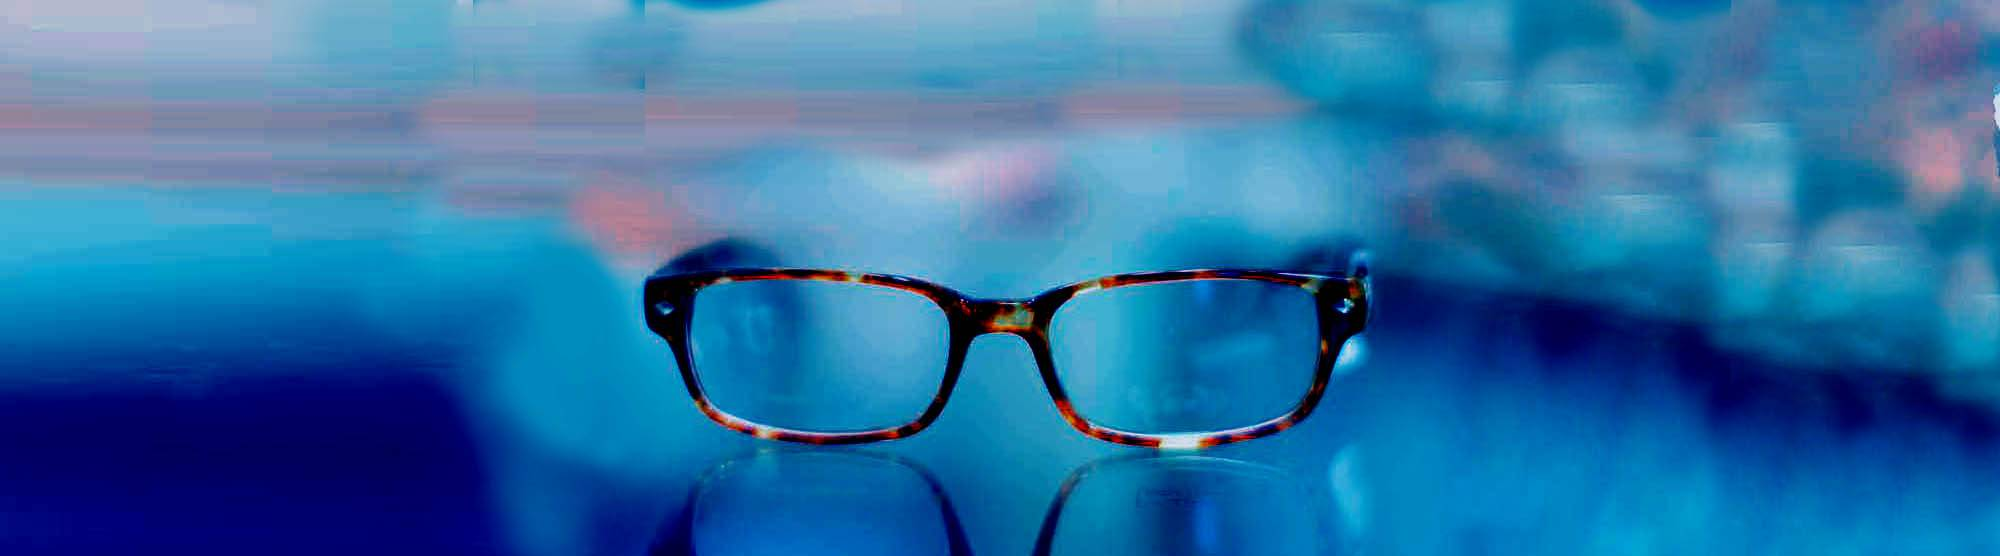 childhero-glasses-blue2